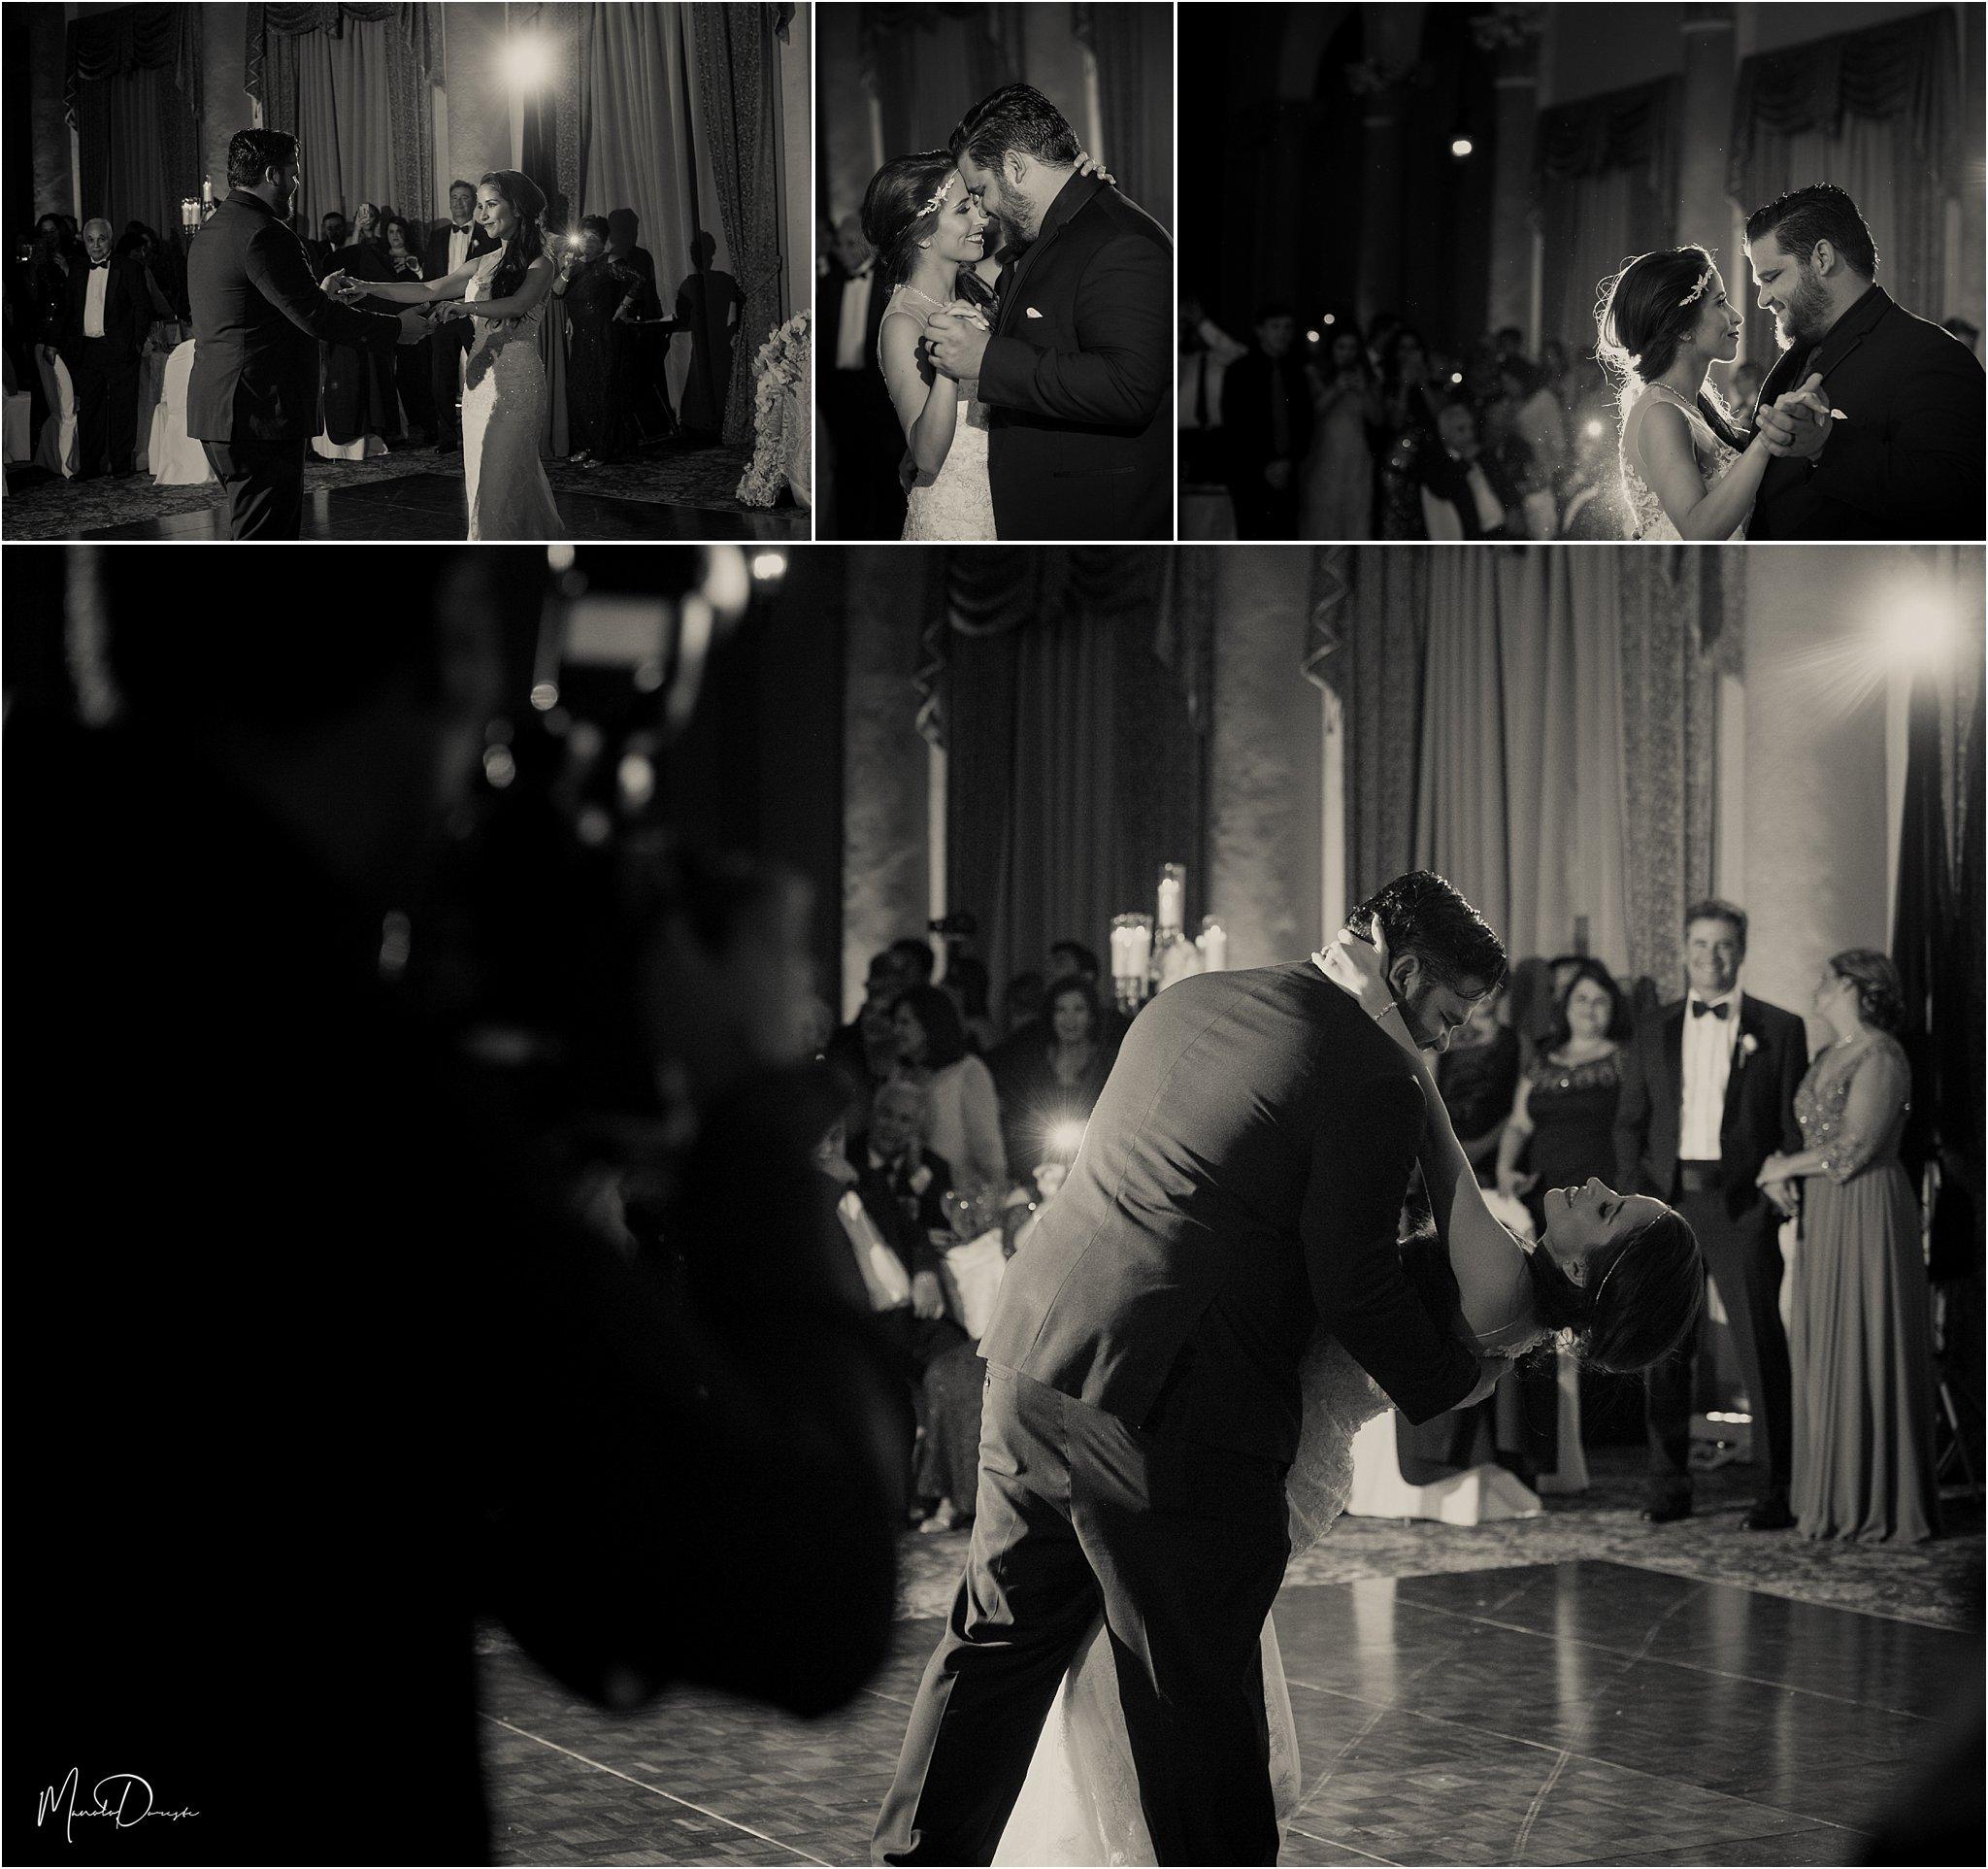 0169_ManoloDoreste_InFocusStudios_Wedding_Family_Photography_Miami_MiamiPhotographer.jpg